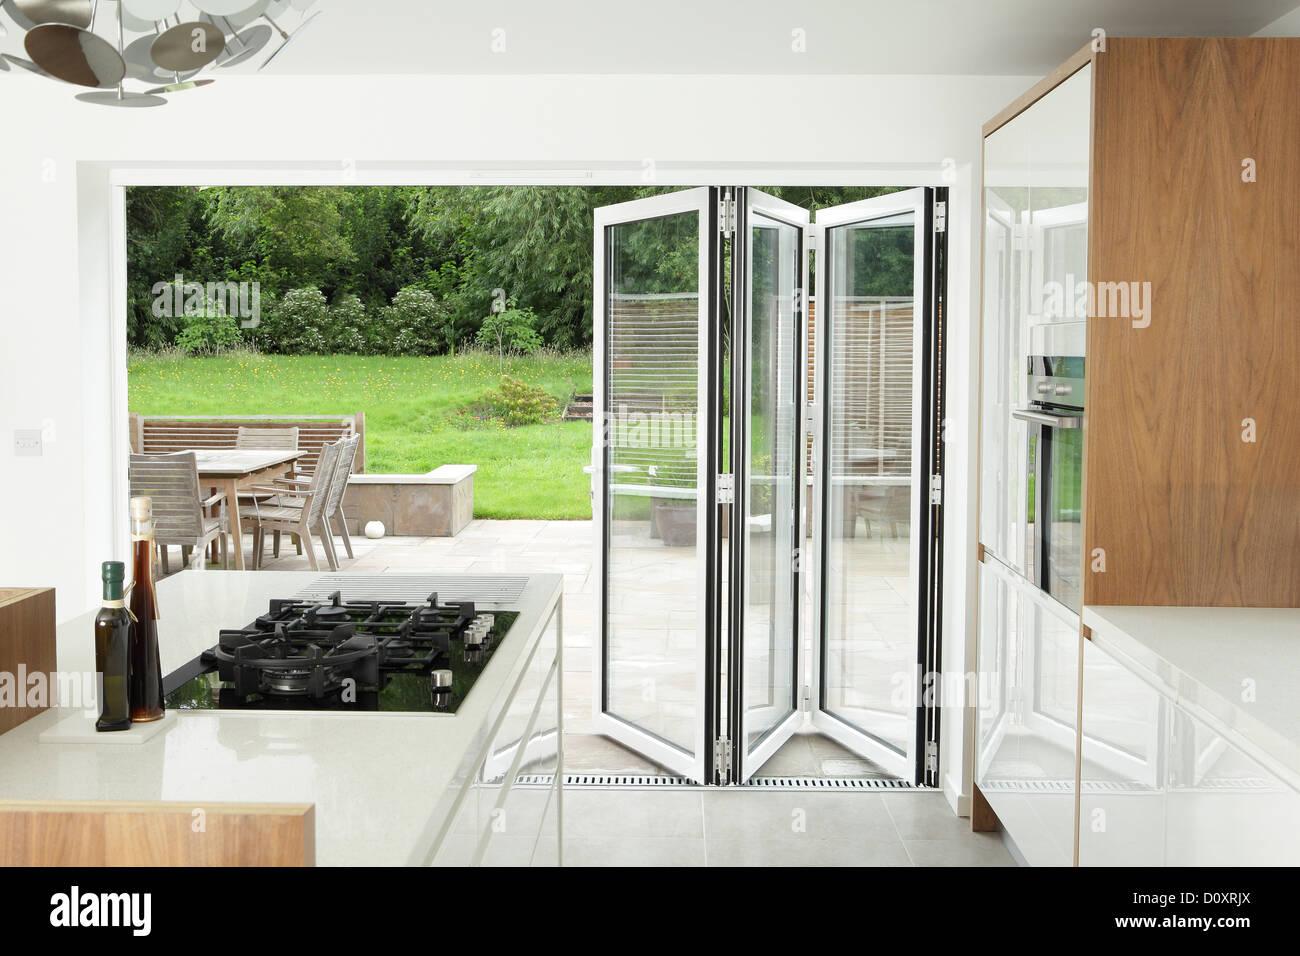 Merveilleux Kitchen With Open Patio Doors   Stock Image